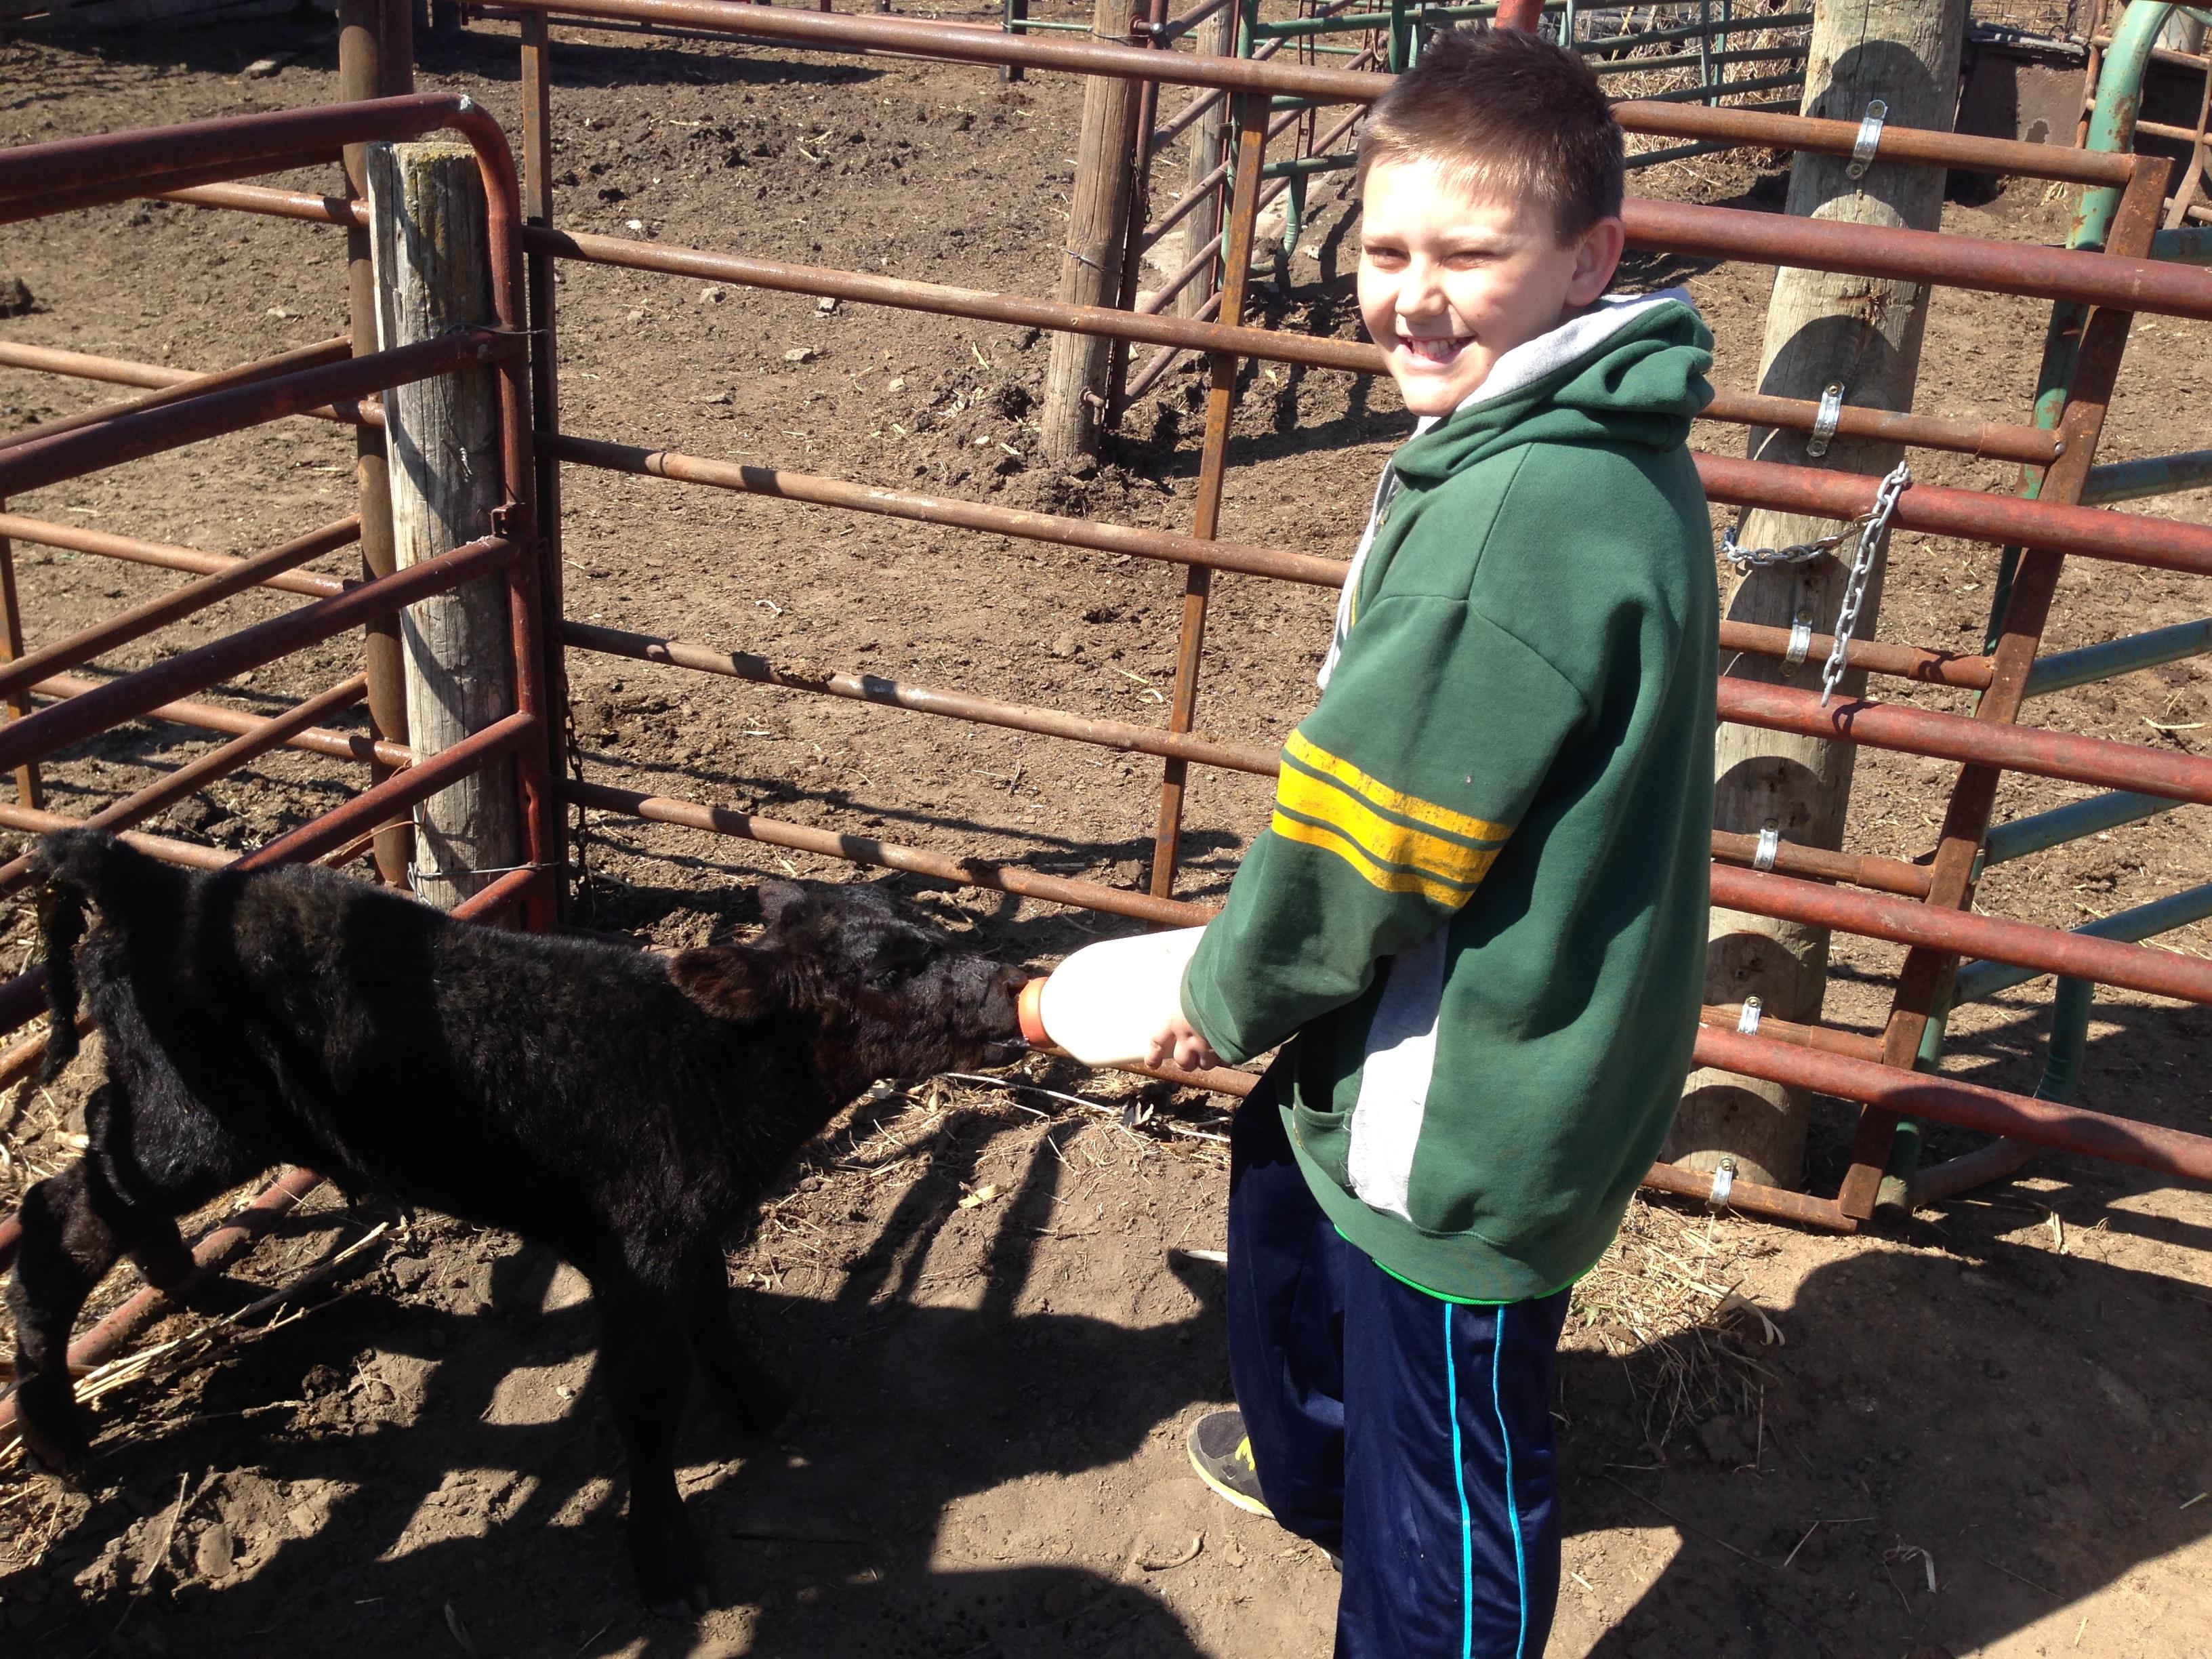 Calf Feeding Bucket_Milk Bucket for Calves with Teats  |Bucket Calves